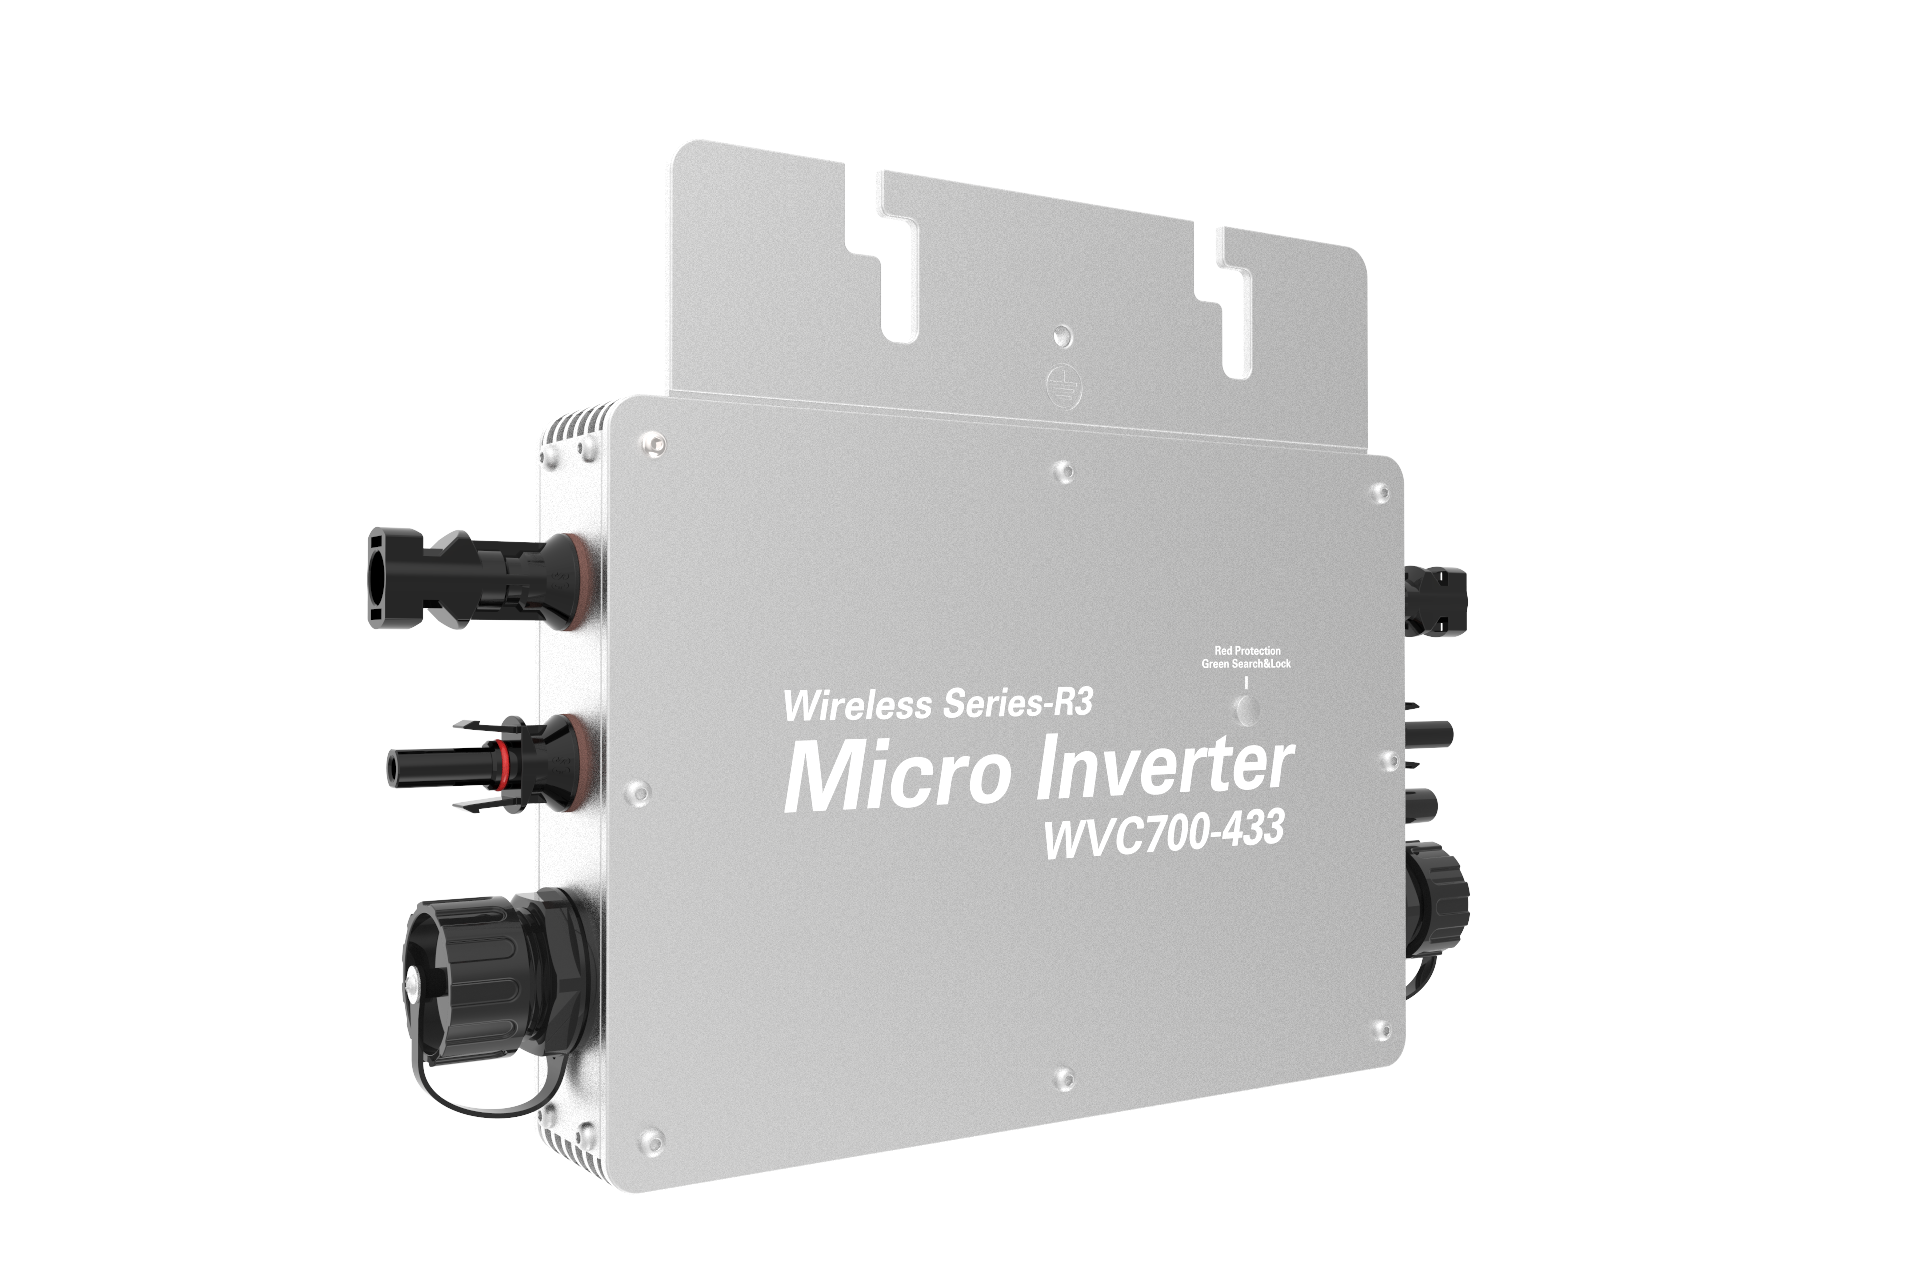 Mikroinwerter_ WVC700 (13)